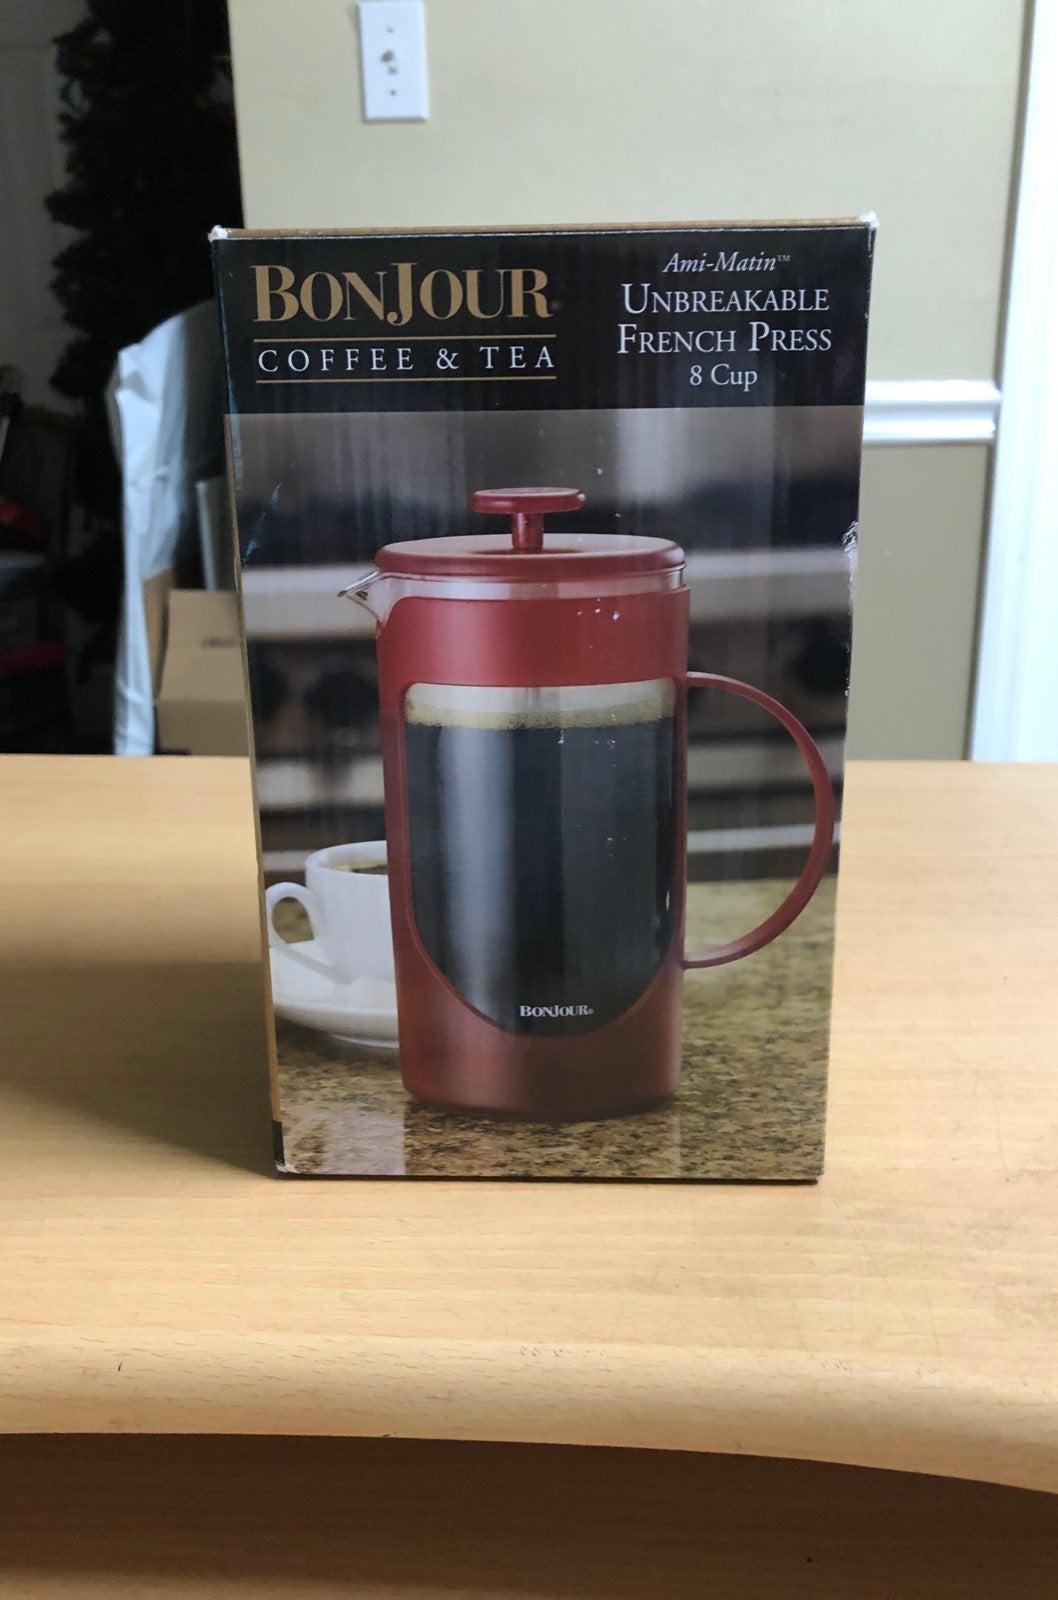 Bonjour Coffee ir Tea French Press 8 Cup